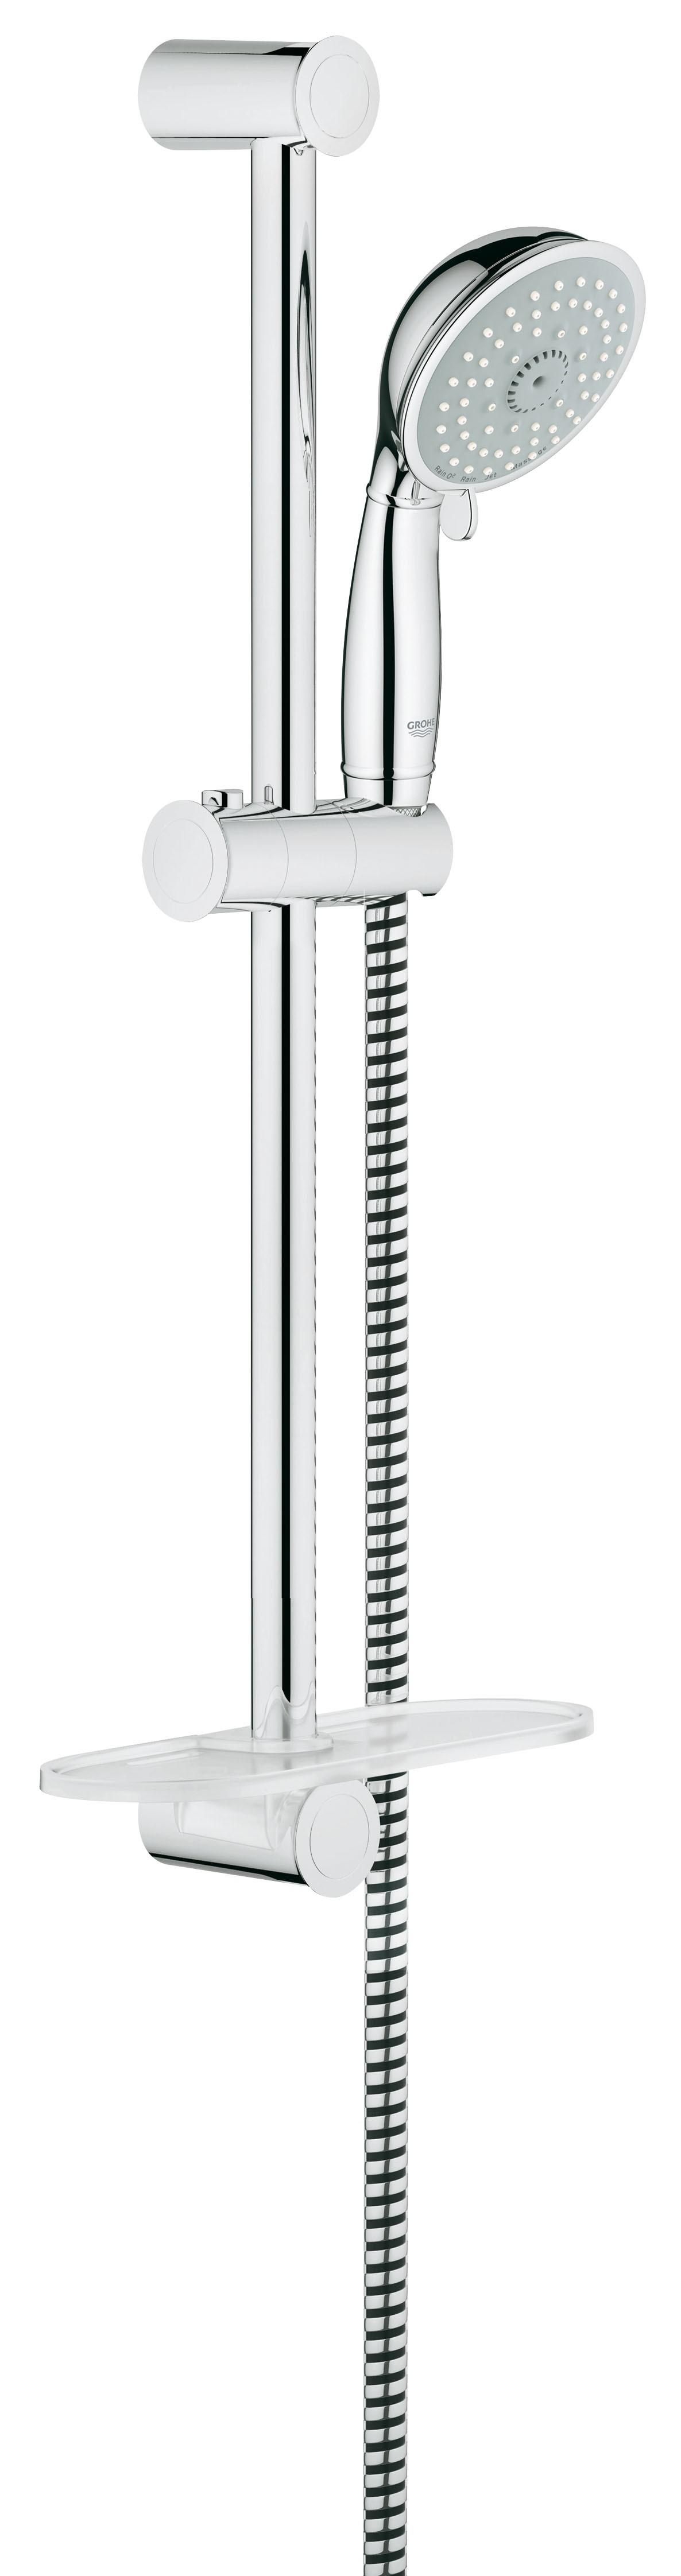 Grohe 27609000 Tempesta Classic (ручной душ, штанга 600 мм, шланг 1750 мм), хром